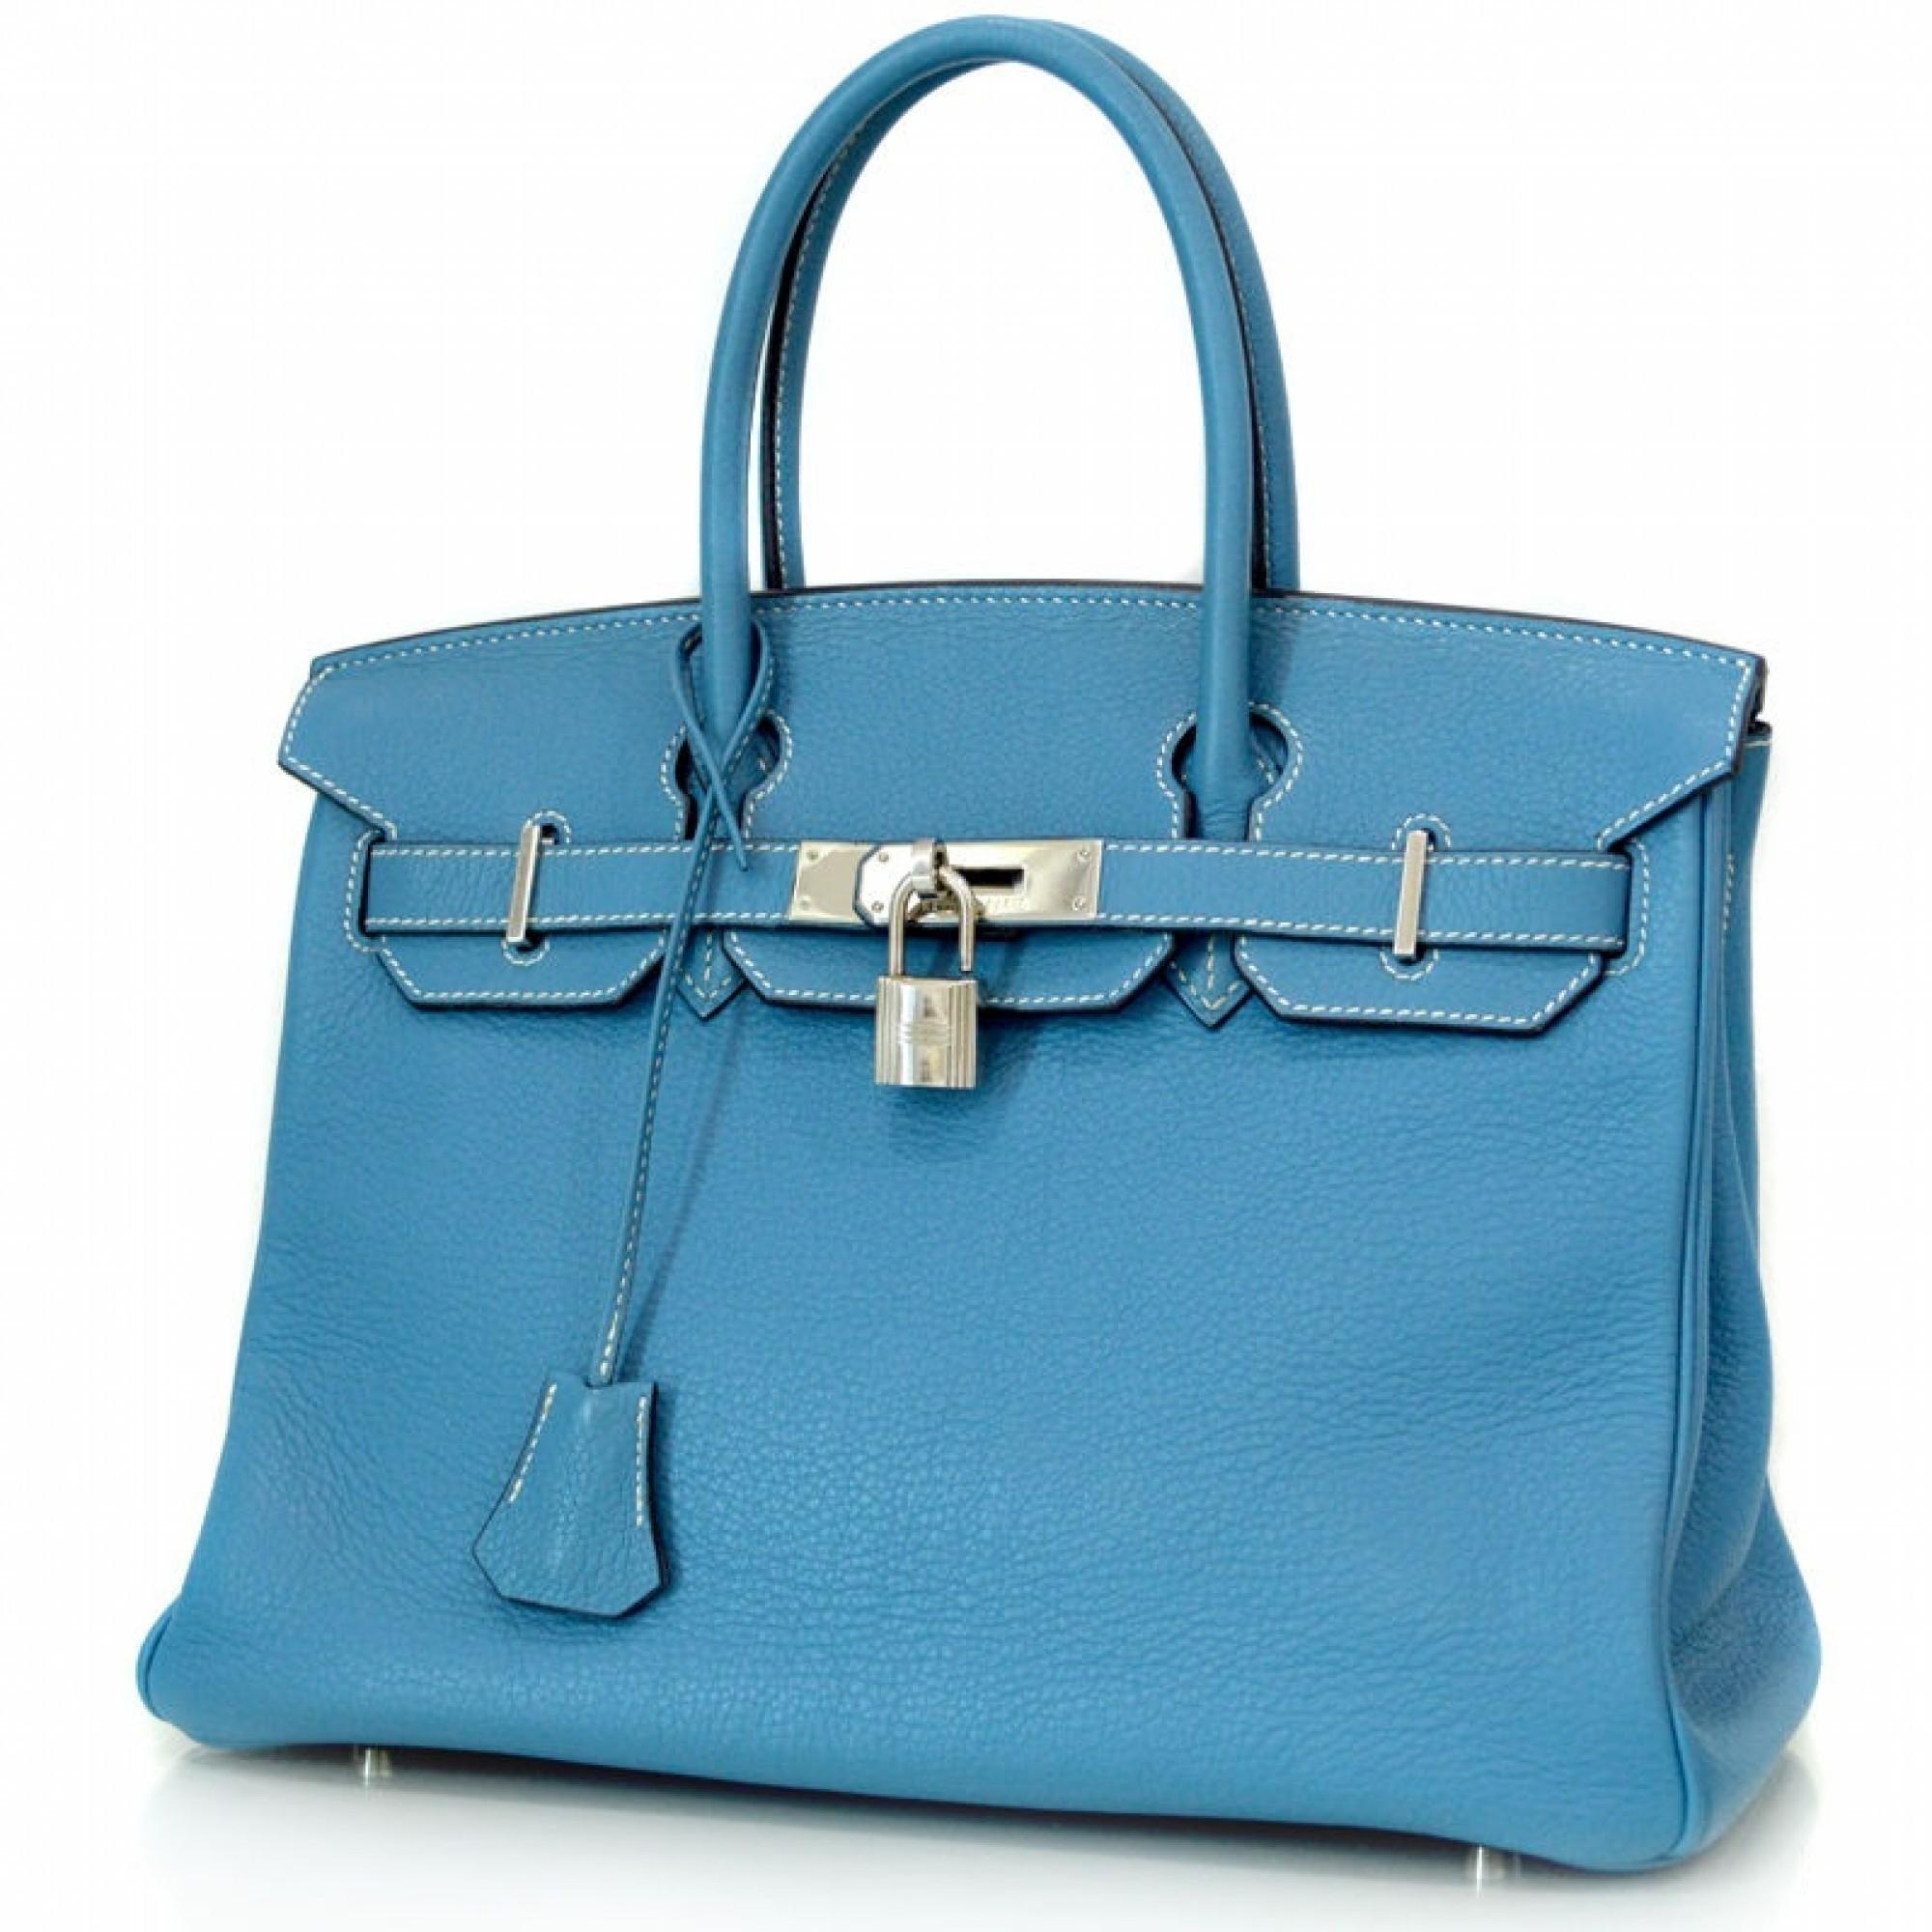 Herm��s Birkin 30 Bleu jean PHW Togo Blue Jean Leather Handbag ...